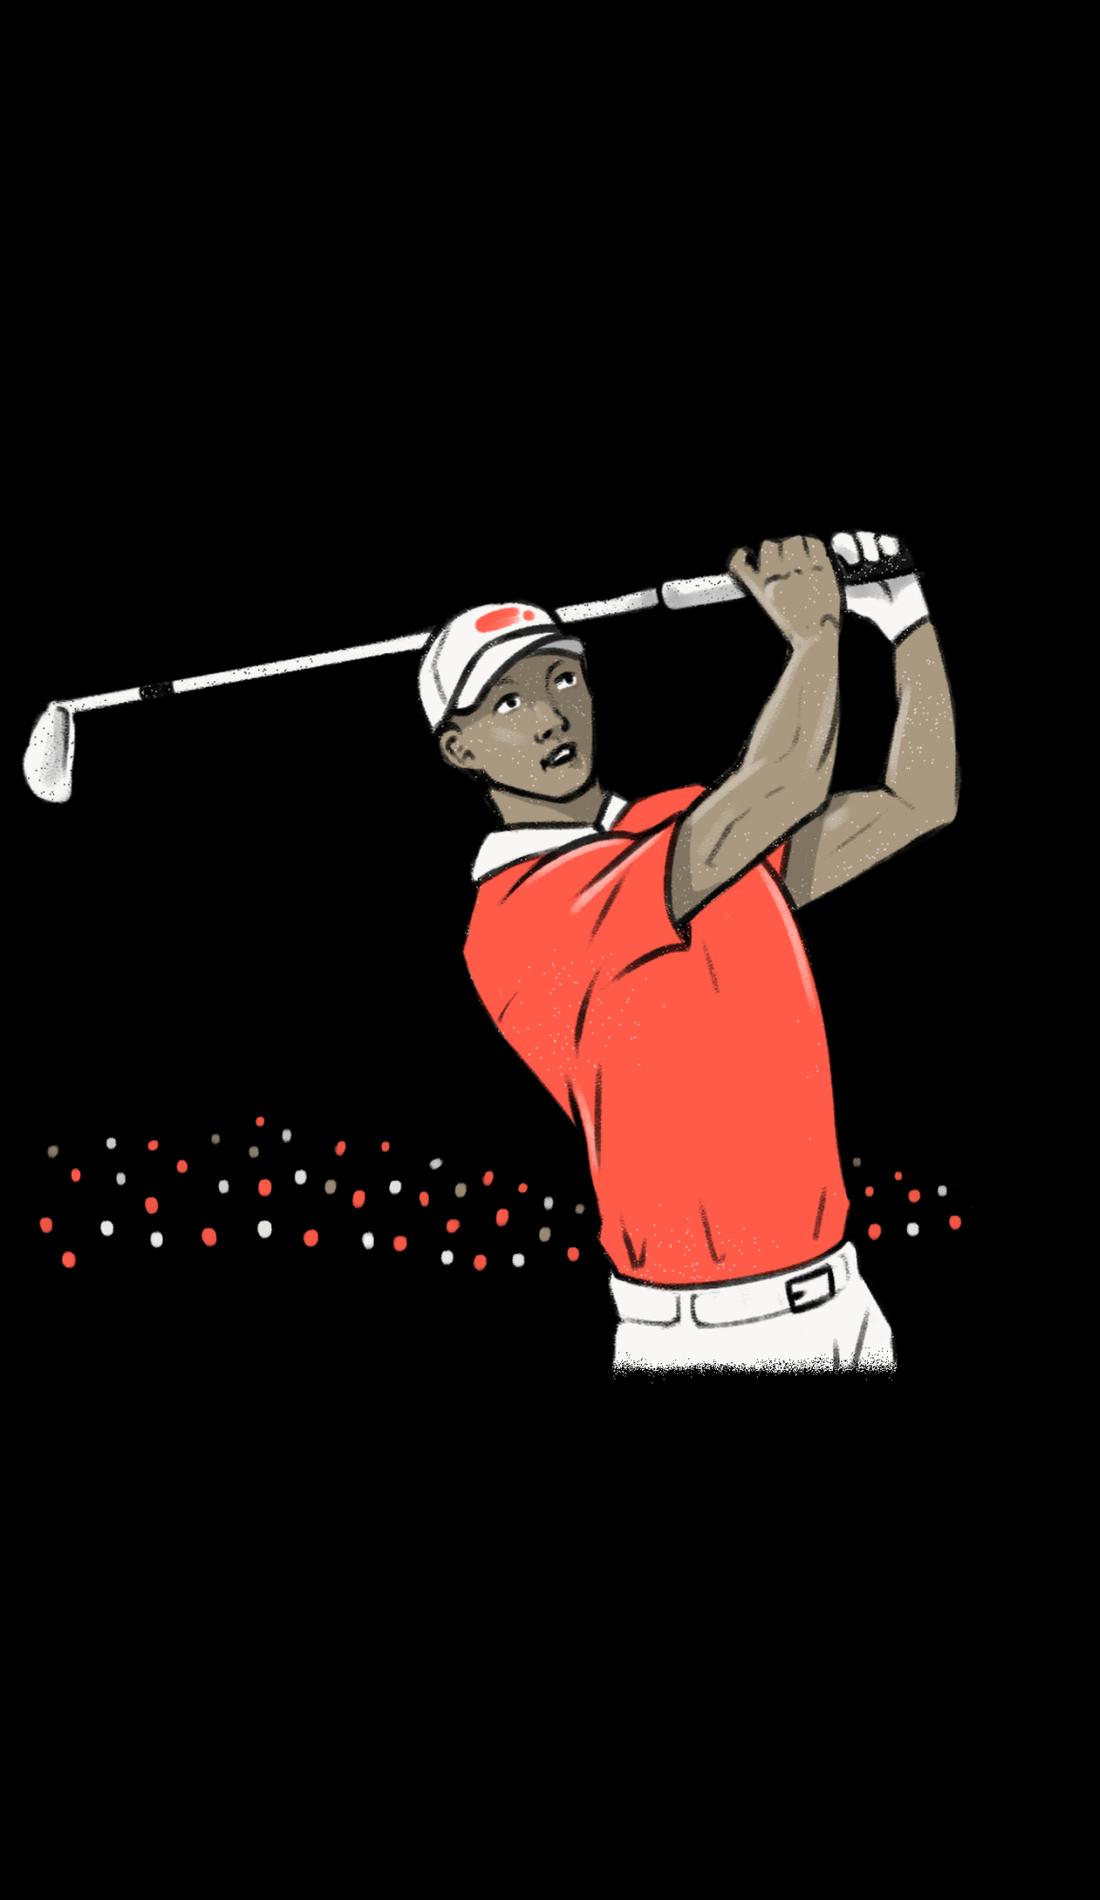 A US Open Golf live event